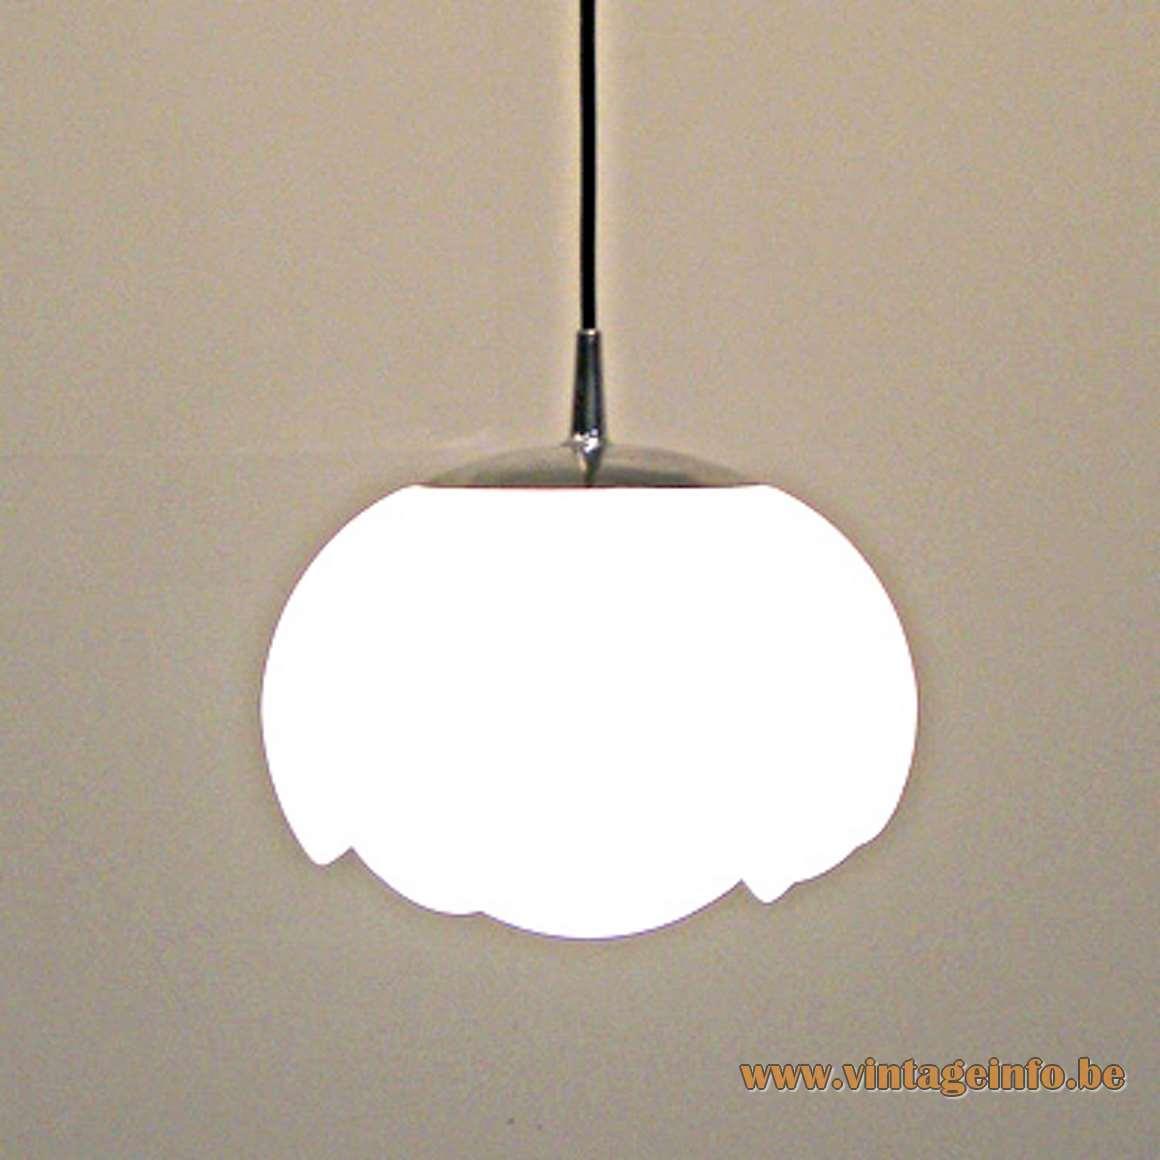 Peill + Putzler Artichoke Pendant Light